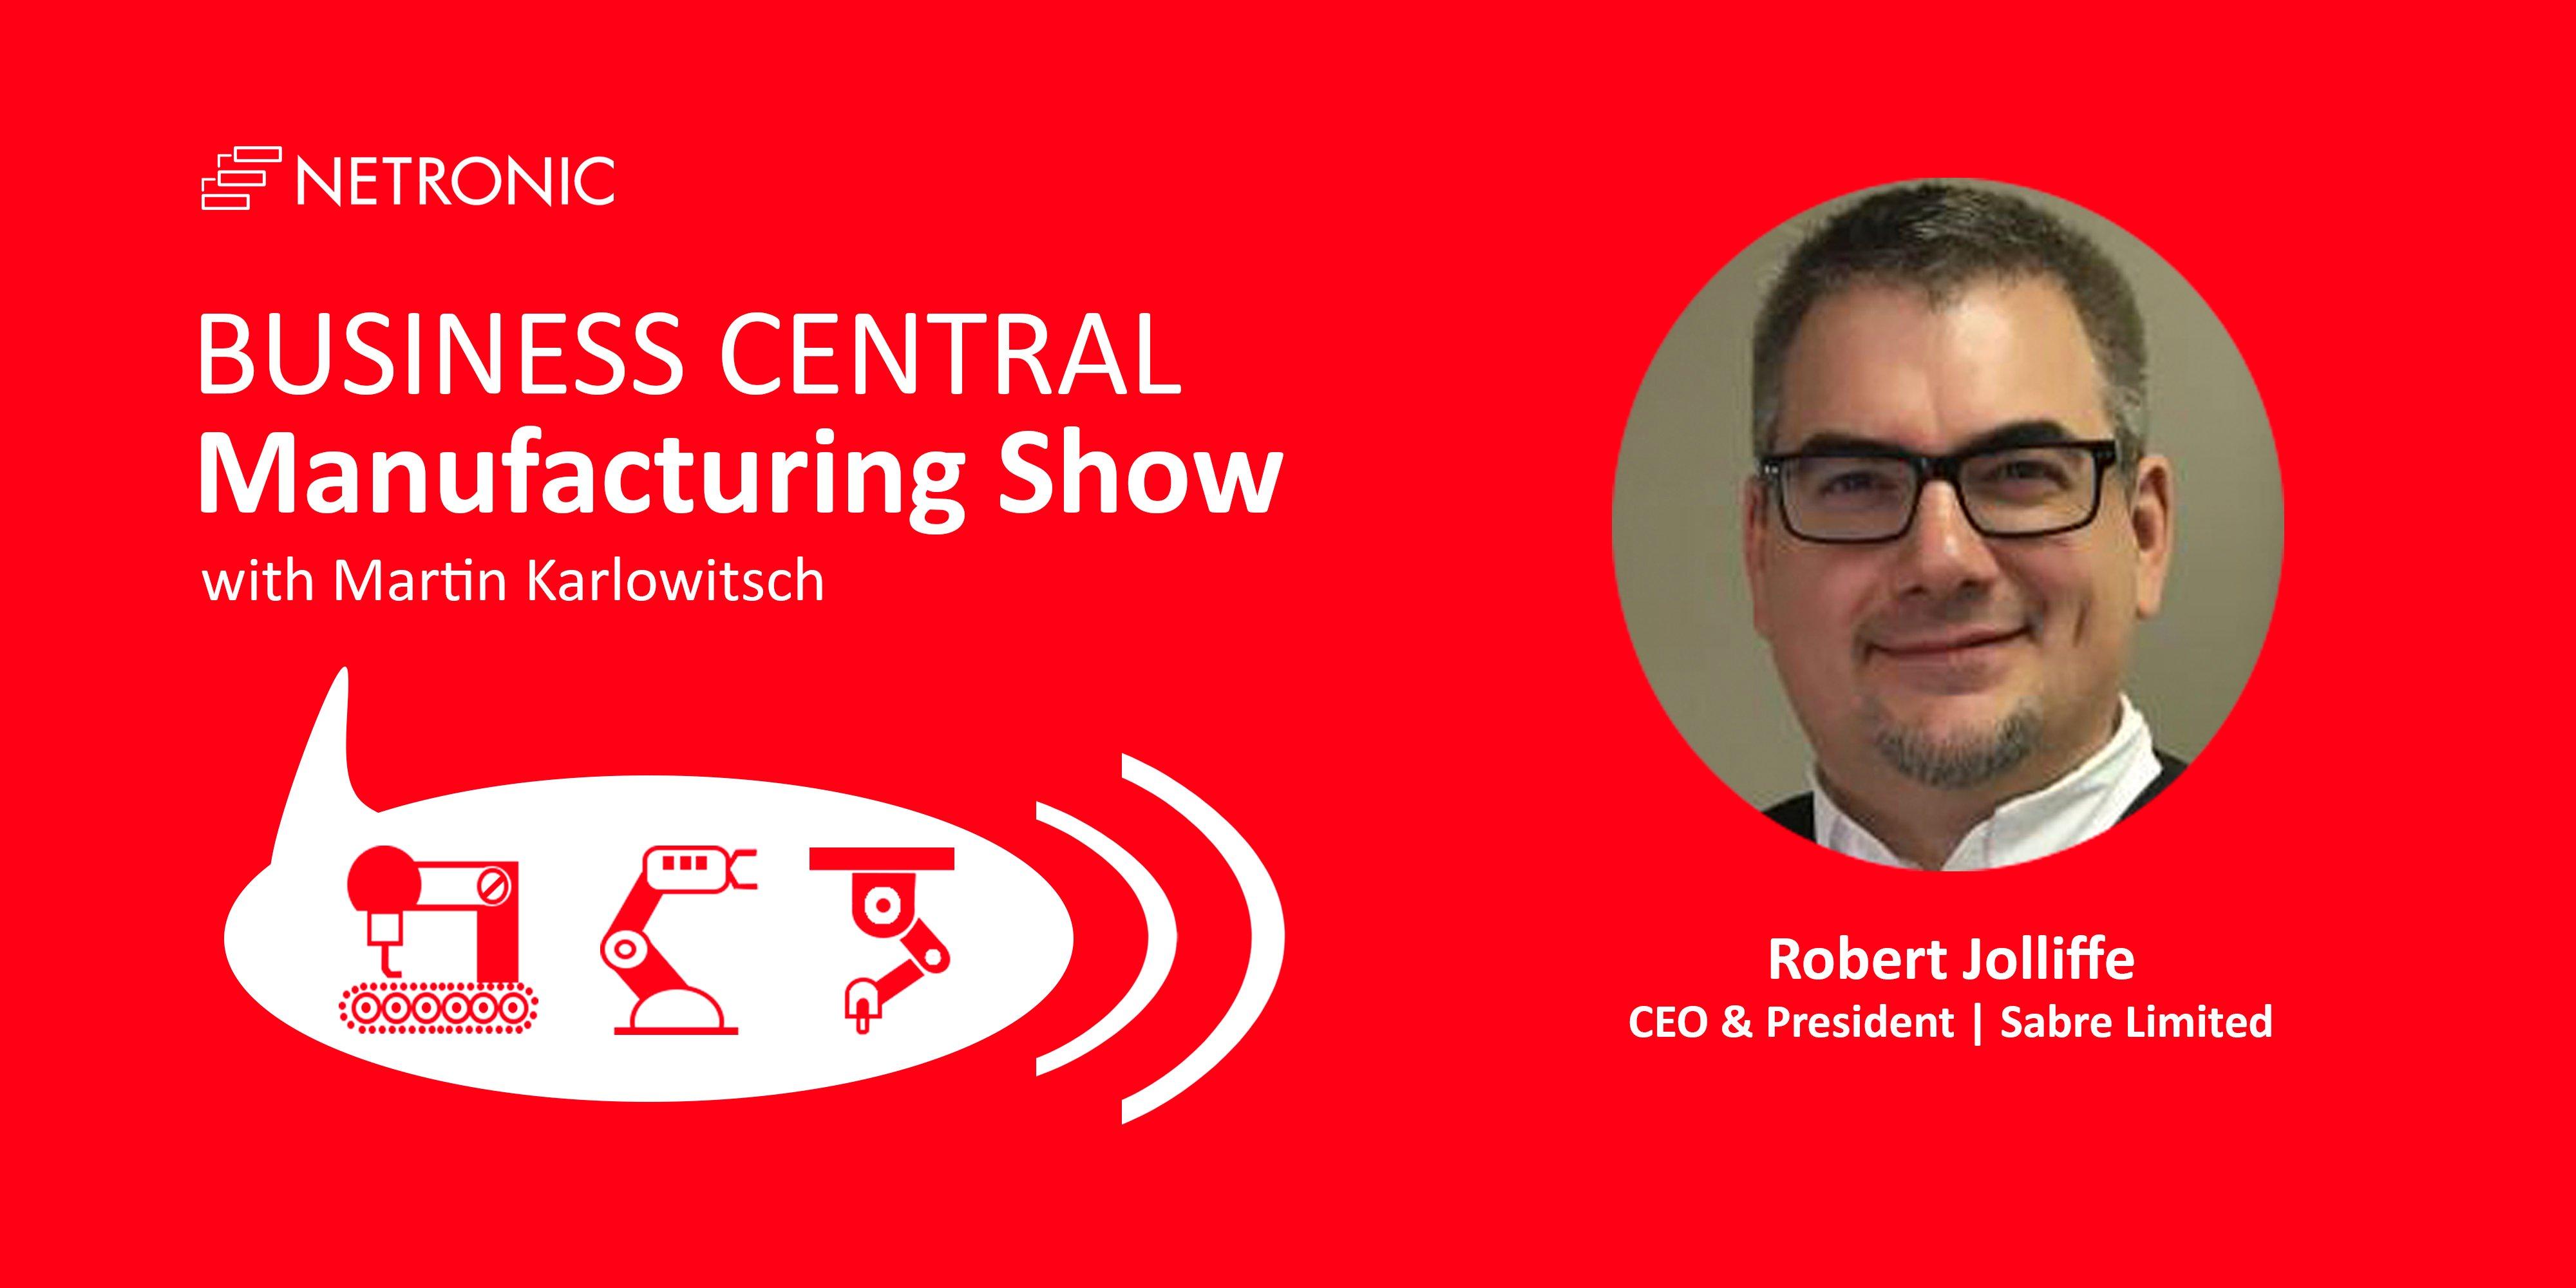 Business Central Manufacturing Show Robert Jolliffe